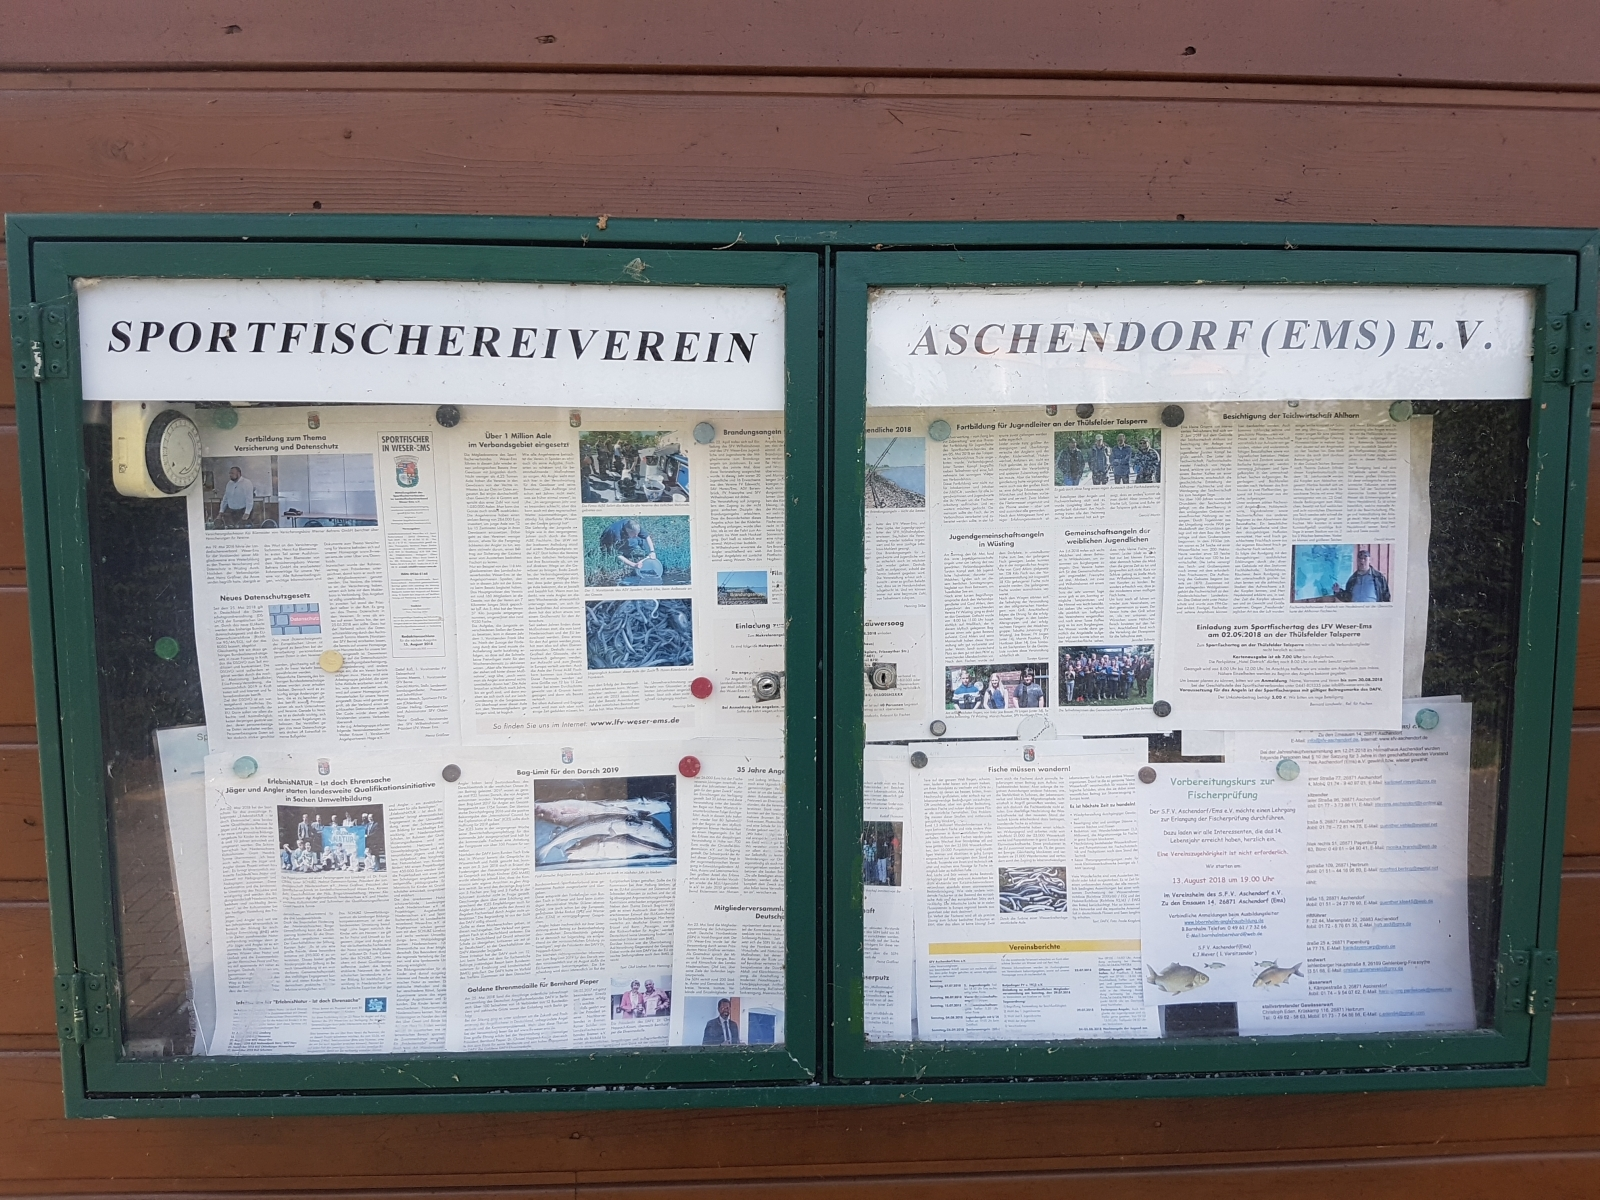 2018-08-22-vereinsheim09